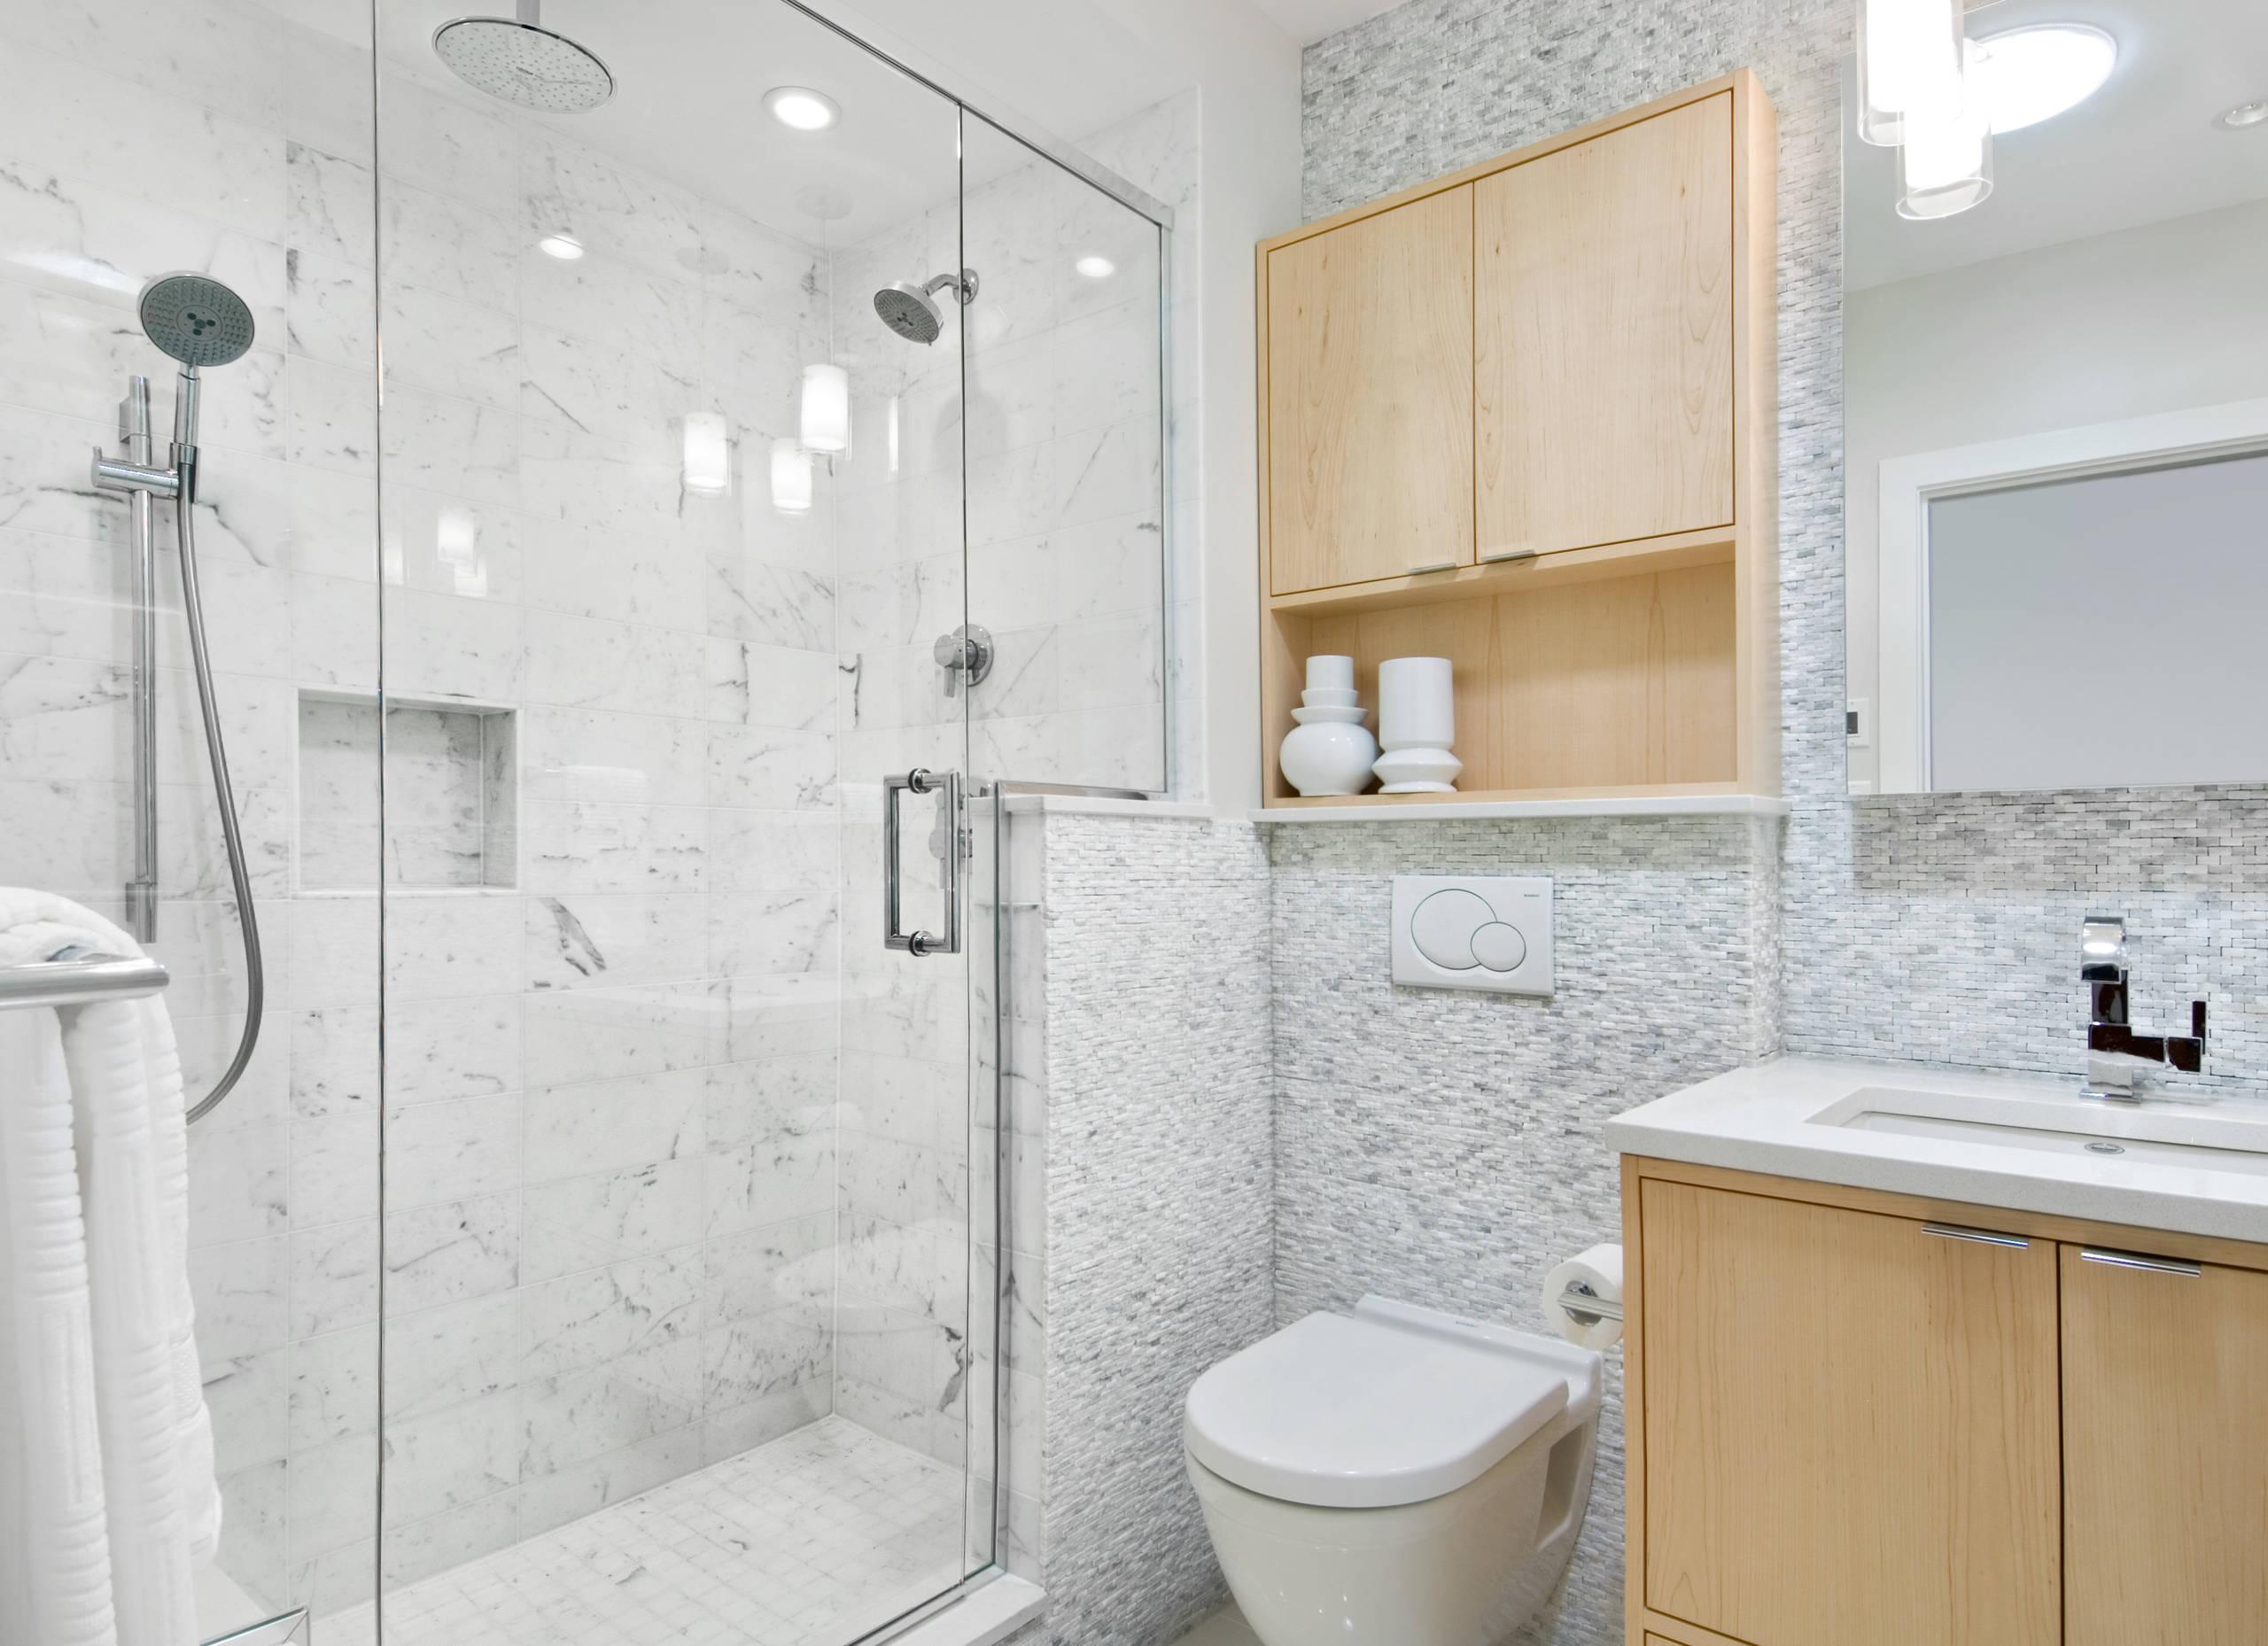 75 Beautiful White Stone Tile Bathroom, White Stone Tile Bathroom